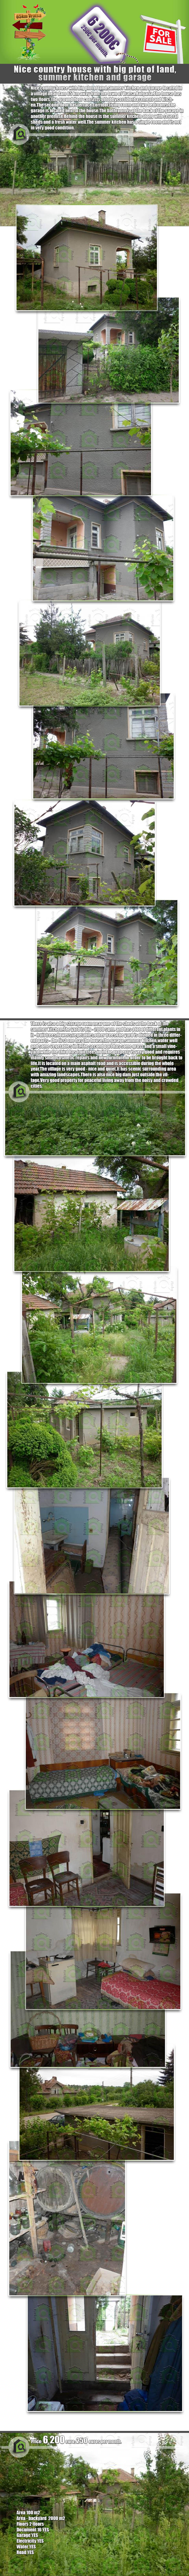 BulgariaPropertyFinder